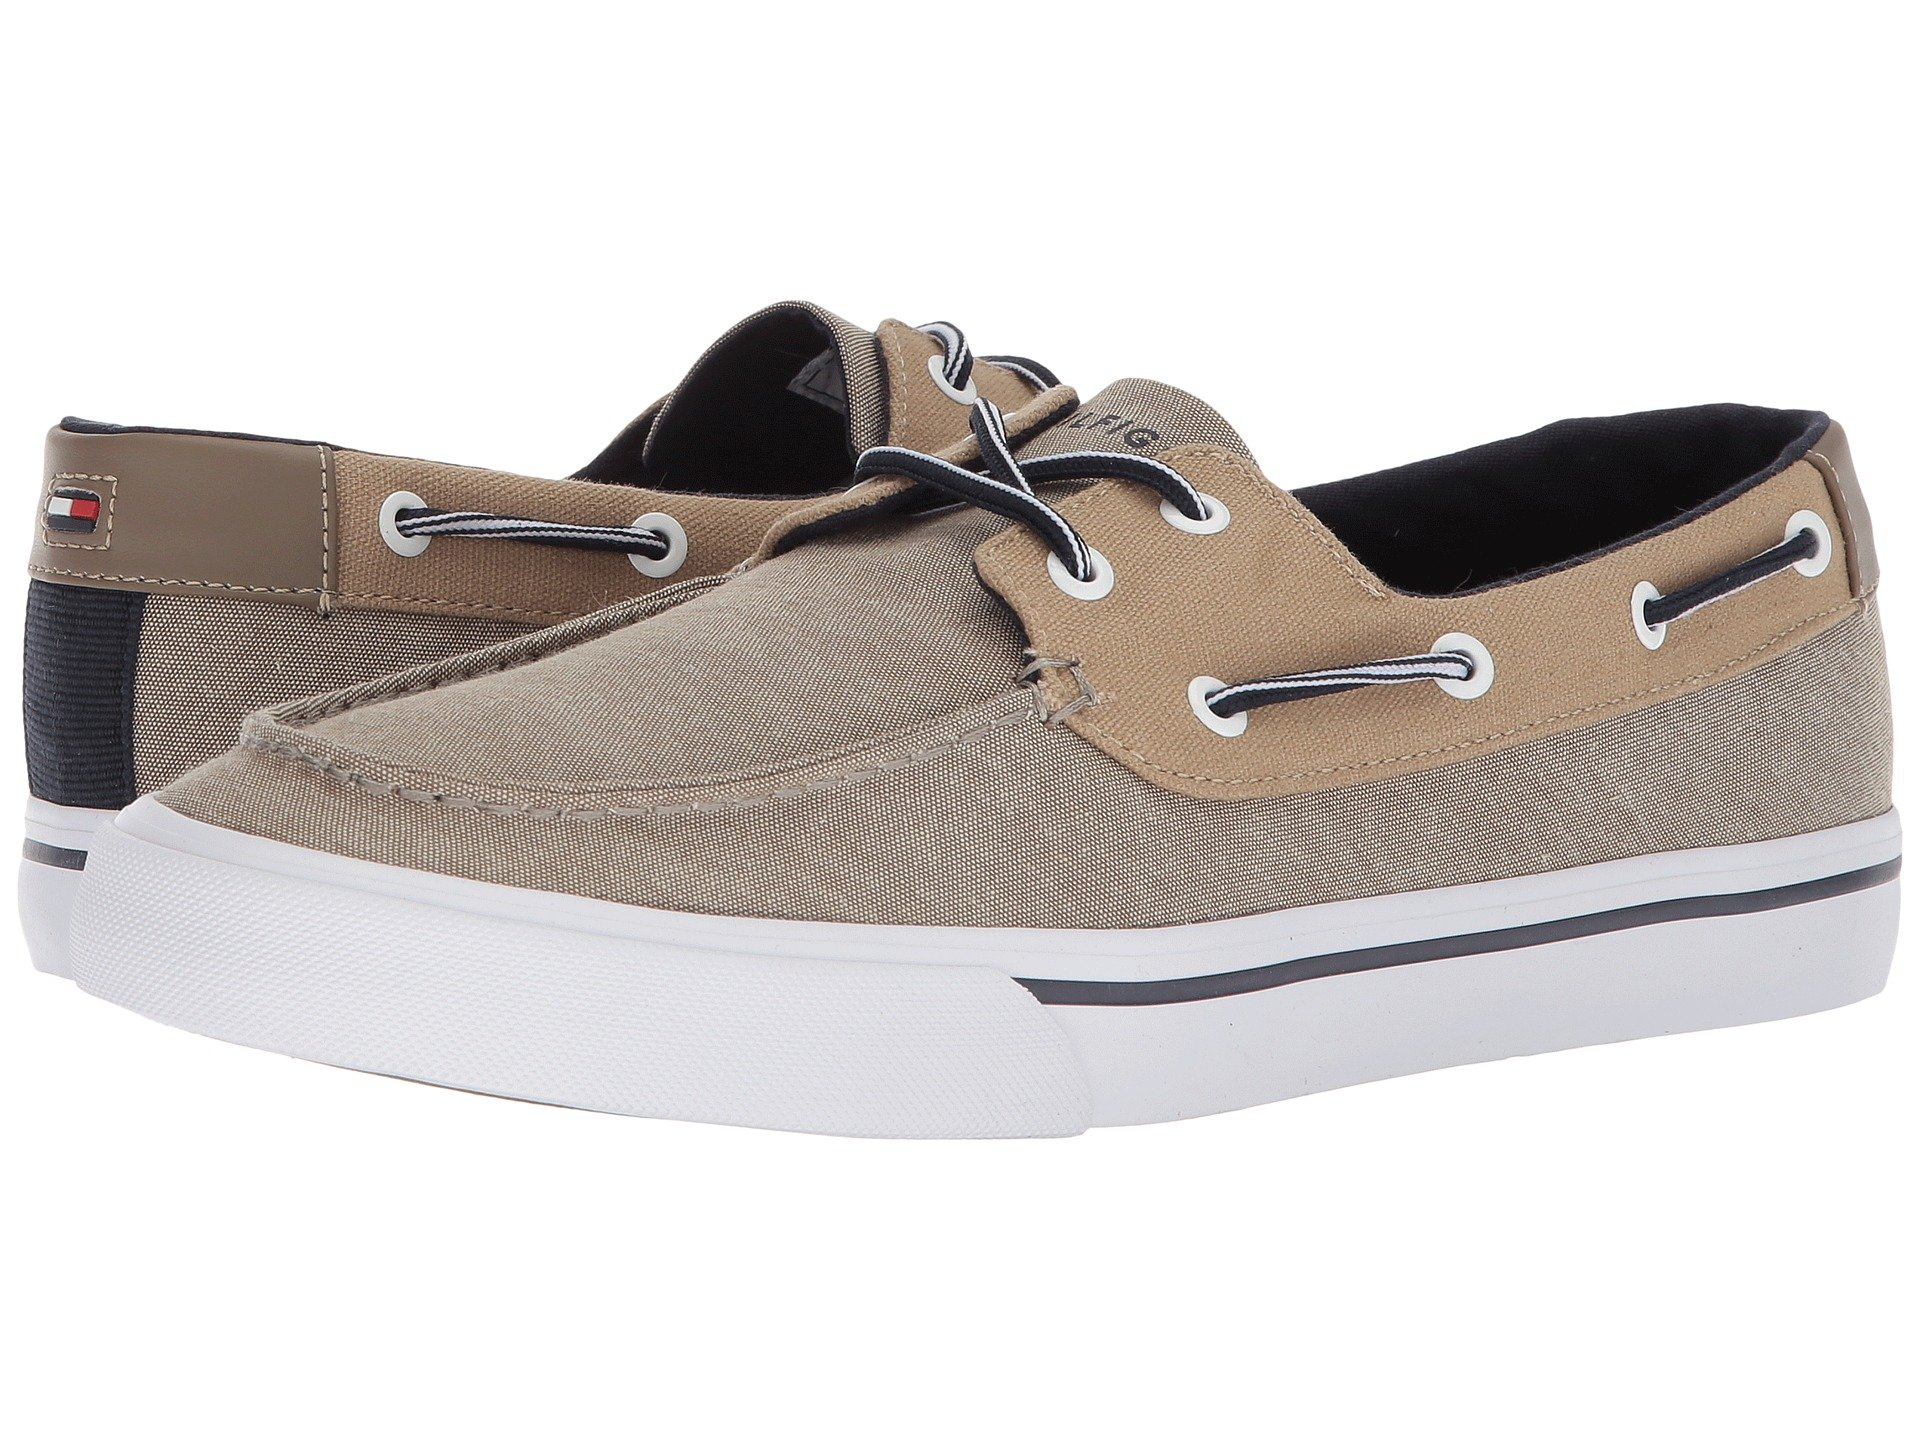 Calzado Tipo Boat Shoe para Hombre Tommy Hilfiger Pharis  + Tommy Hilfiger en VeoyCompro.net